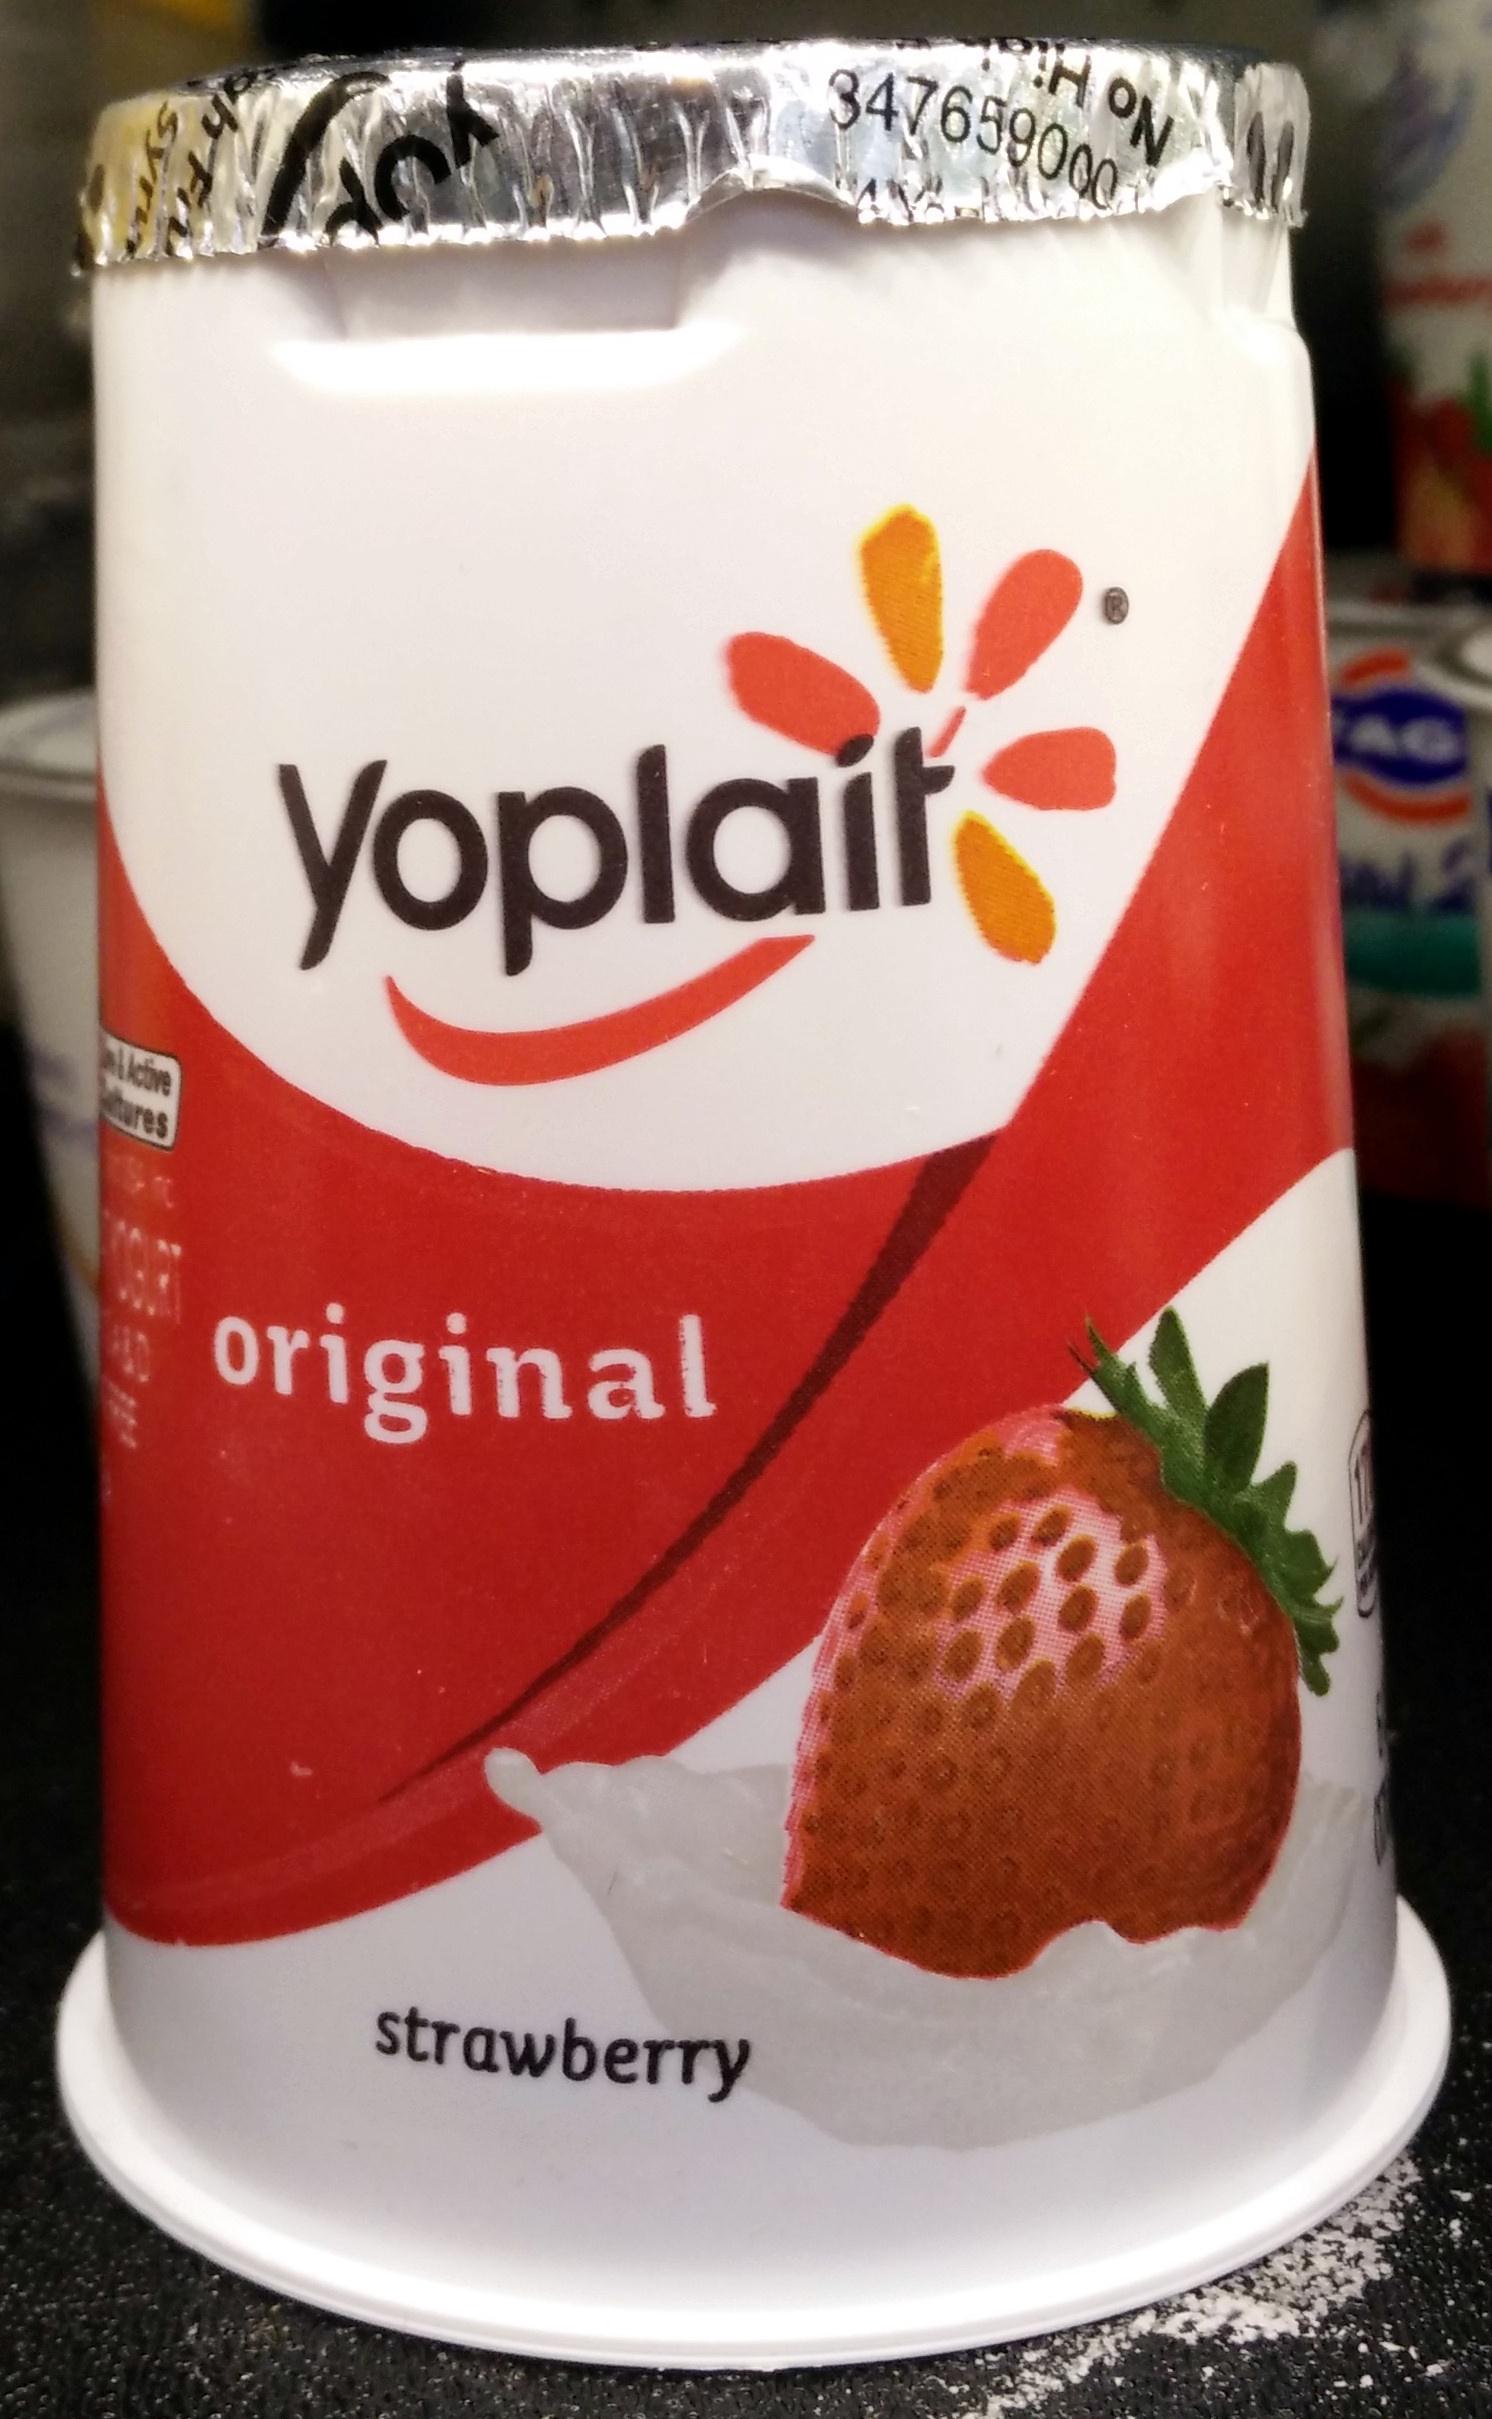 Yoplait Original Strawberry Low Fat Yogurt - Product - en